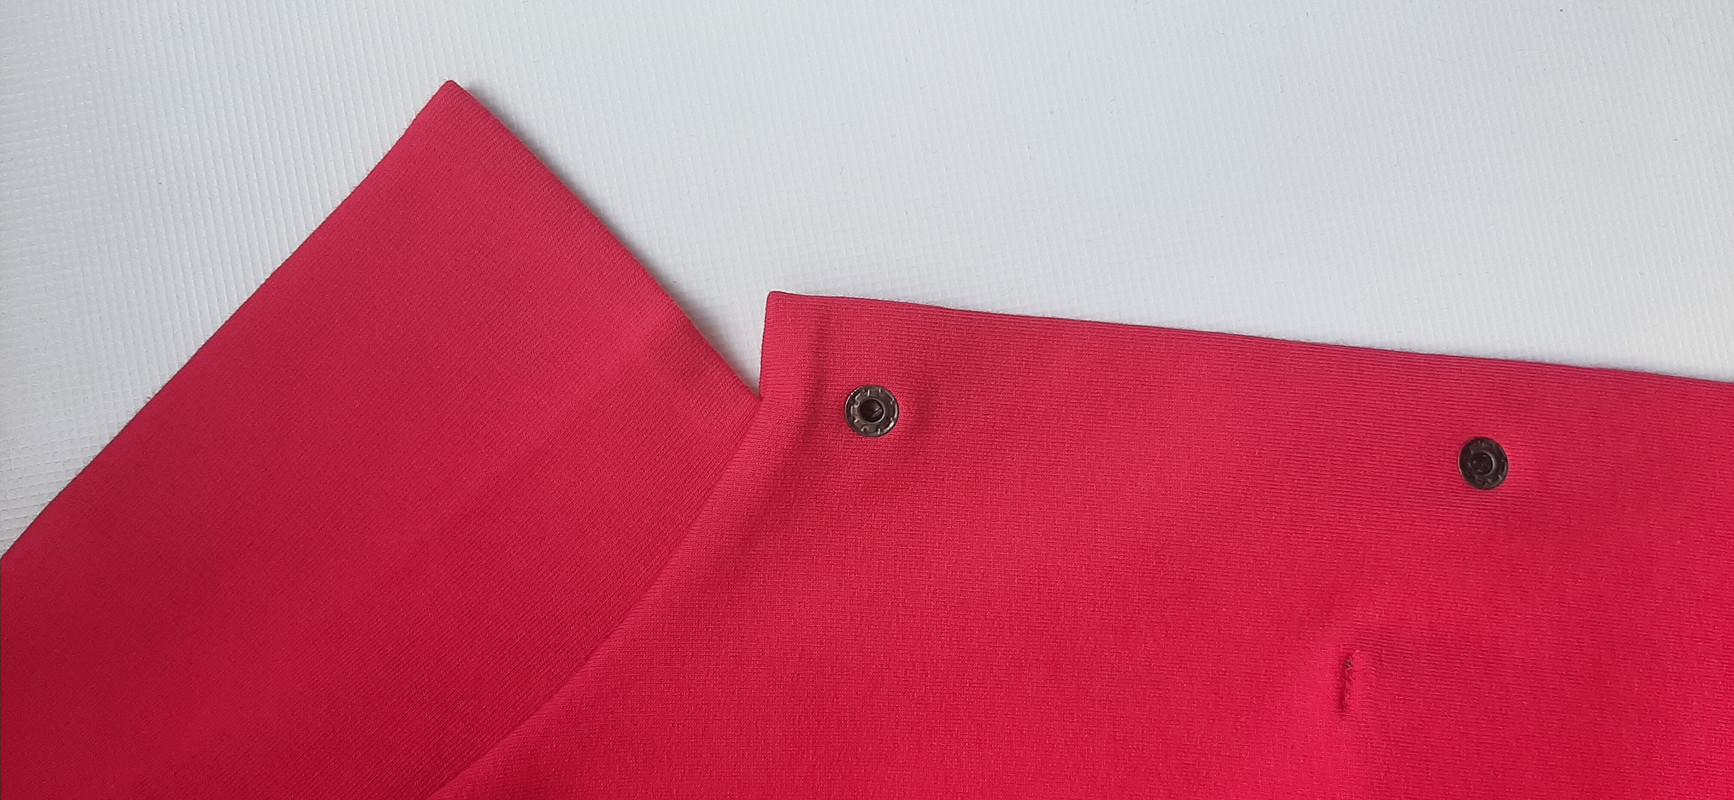 Яркая базовая Рубашка от vetoshkinaoa